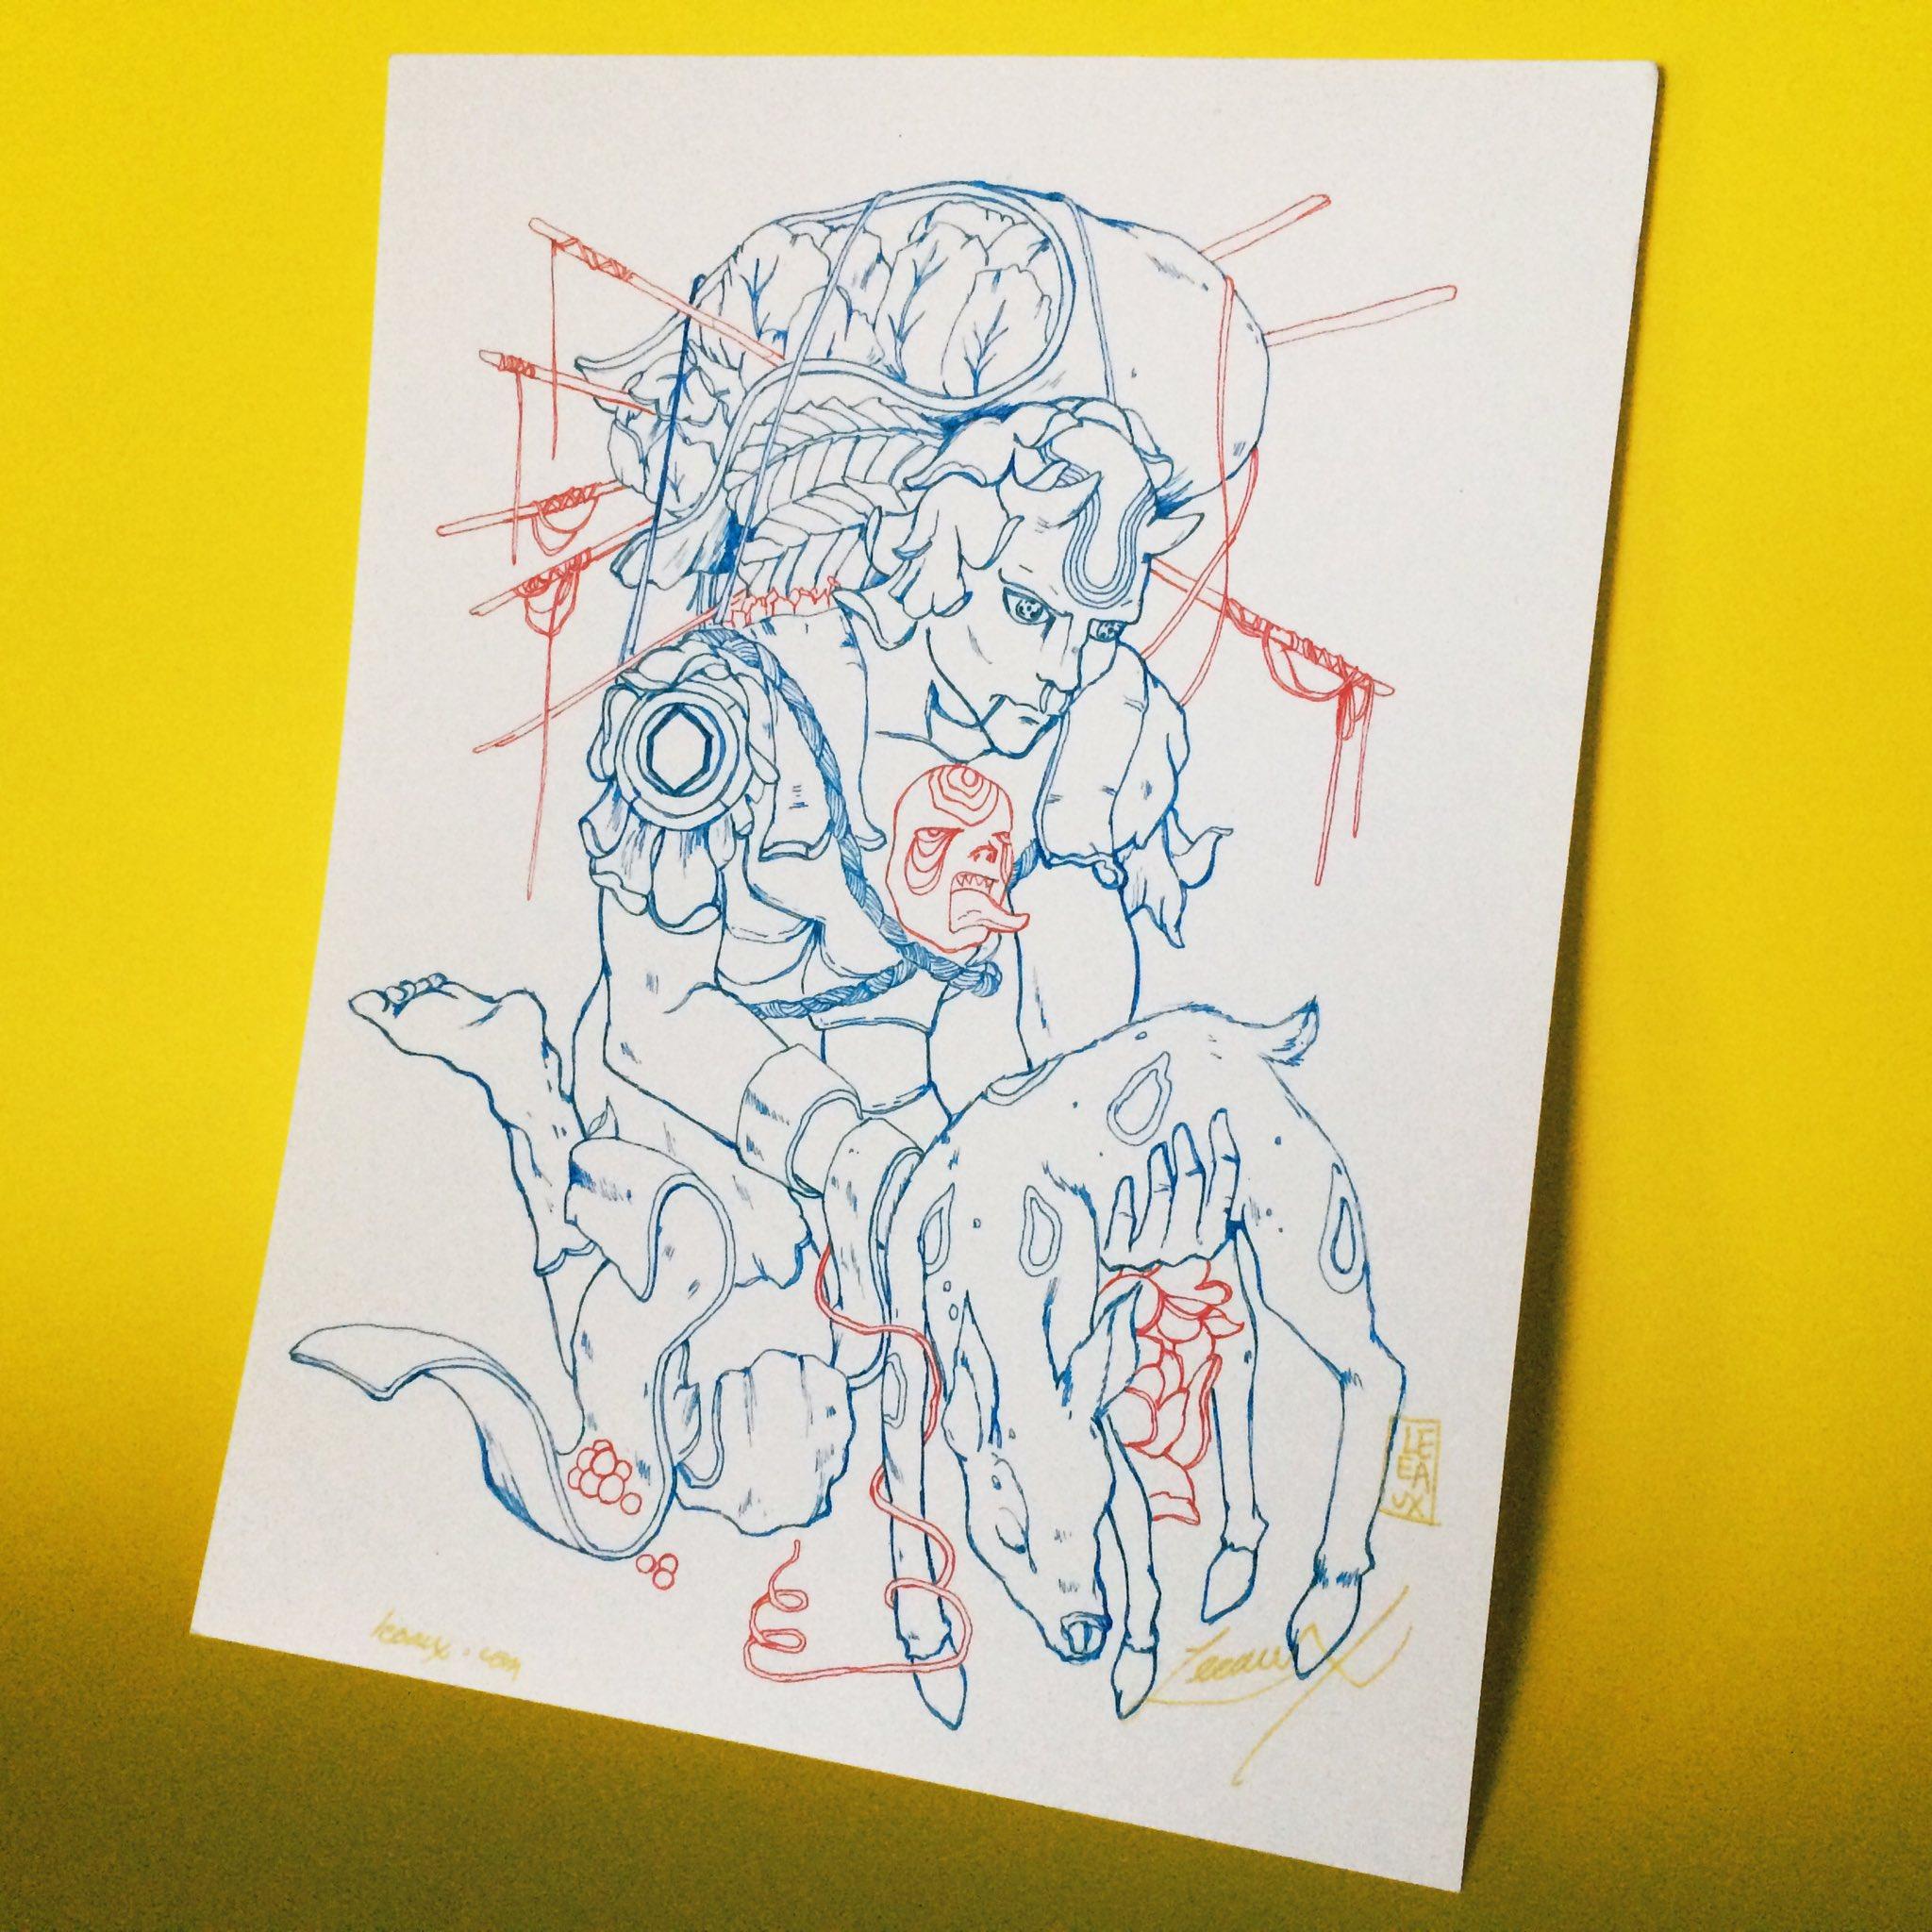 """Prologue"" art by Leeaux"